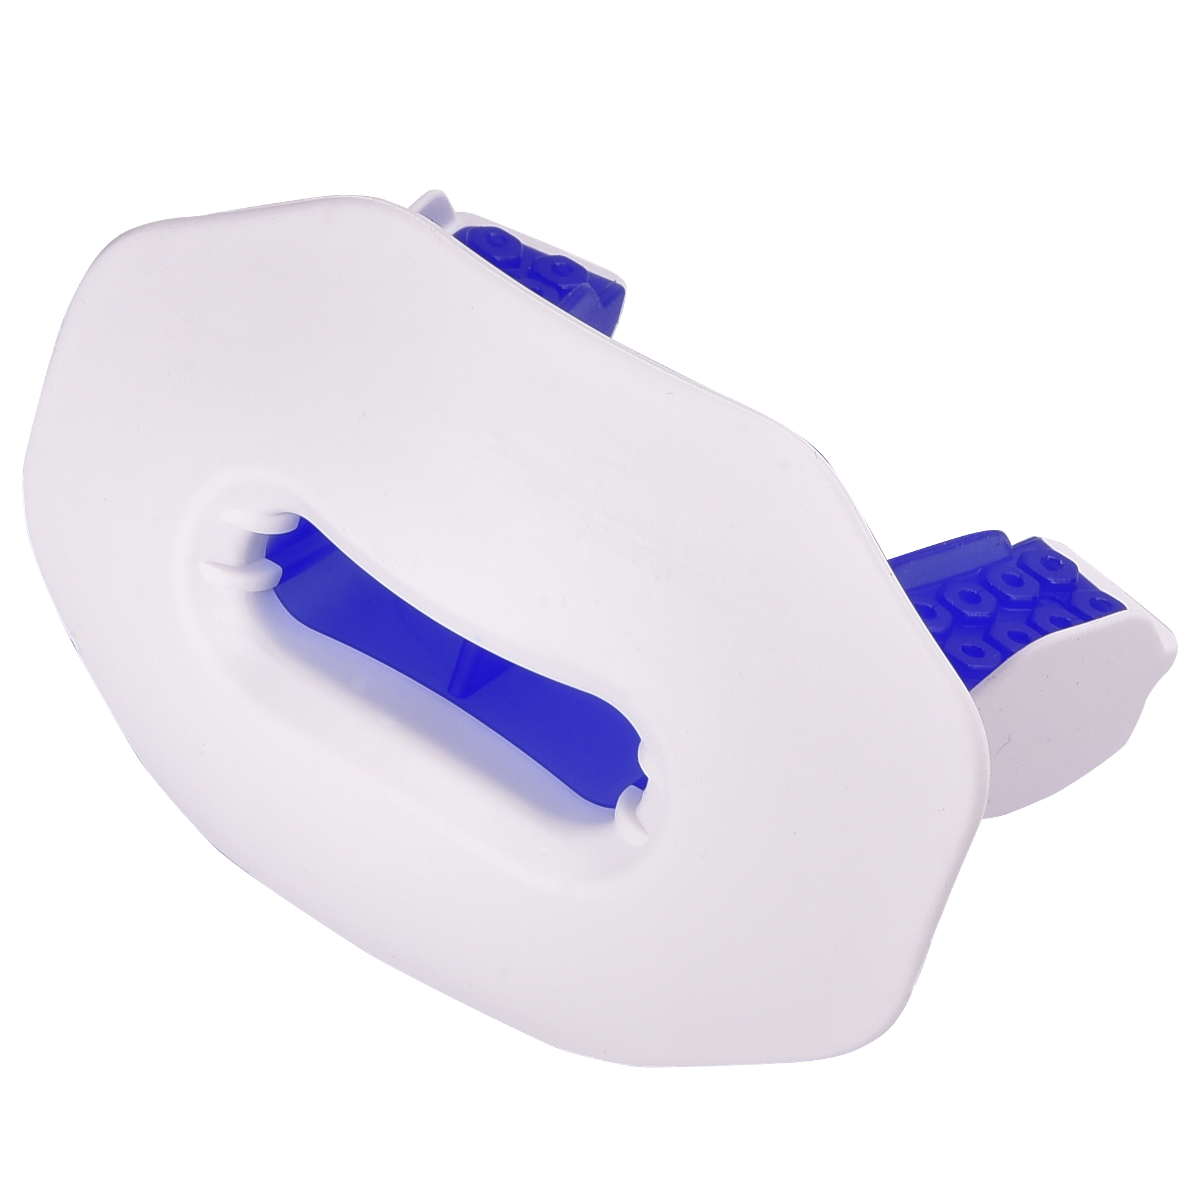 lip guard mouthpiece white blue